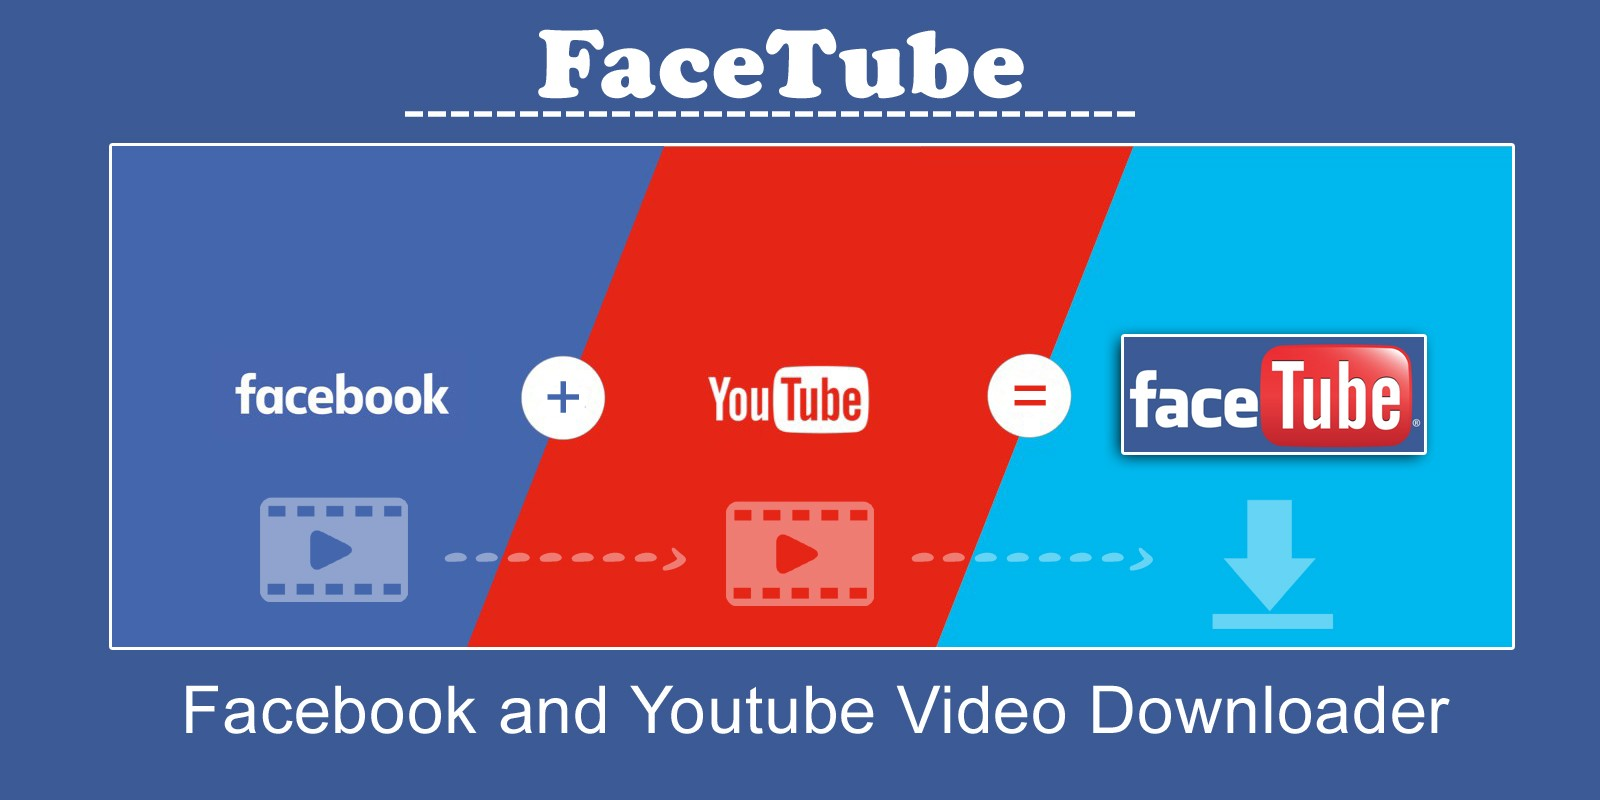 FaceTube - Facebook Youtube Video Downloader